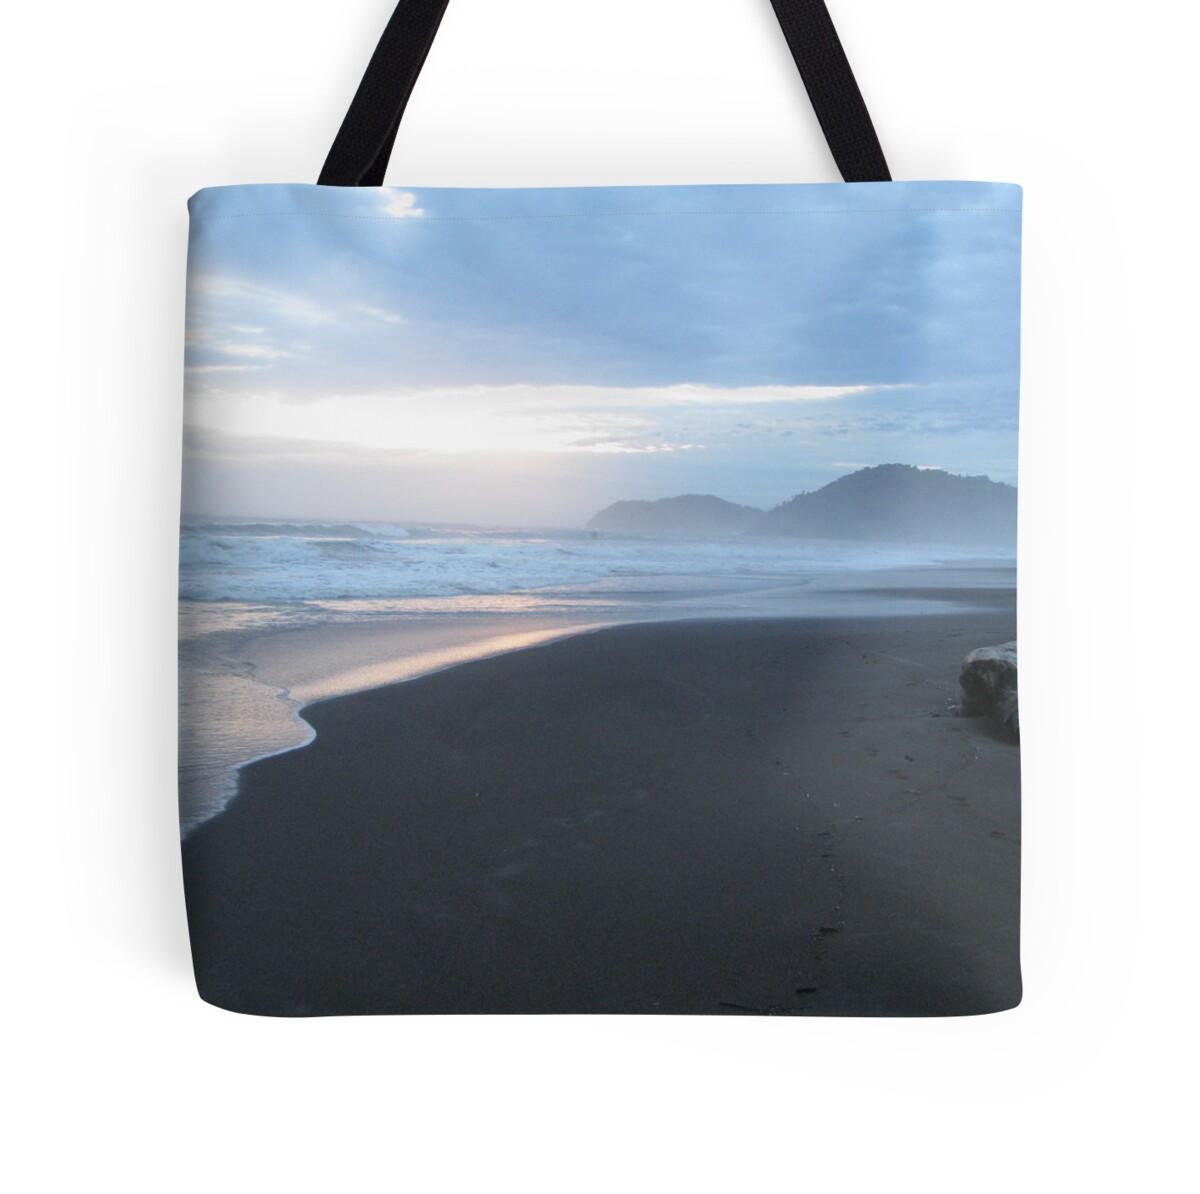 Tote Bag - Sky by VIDA VIDA